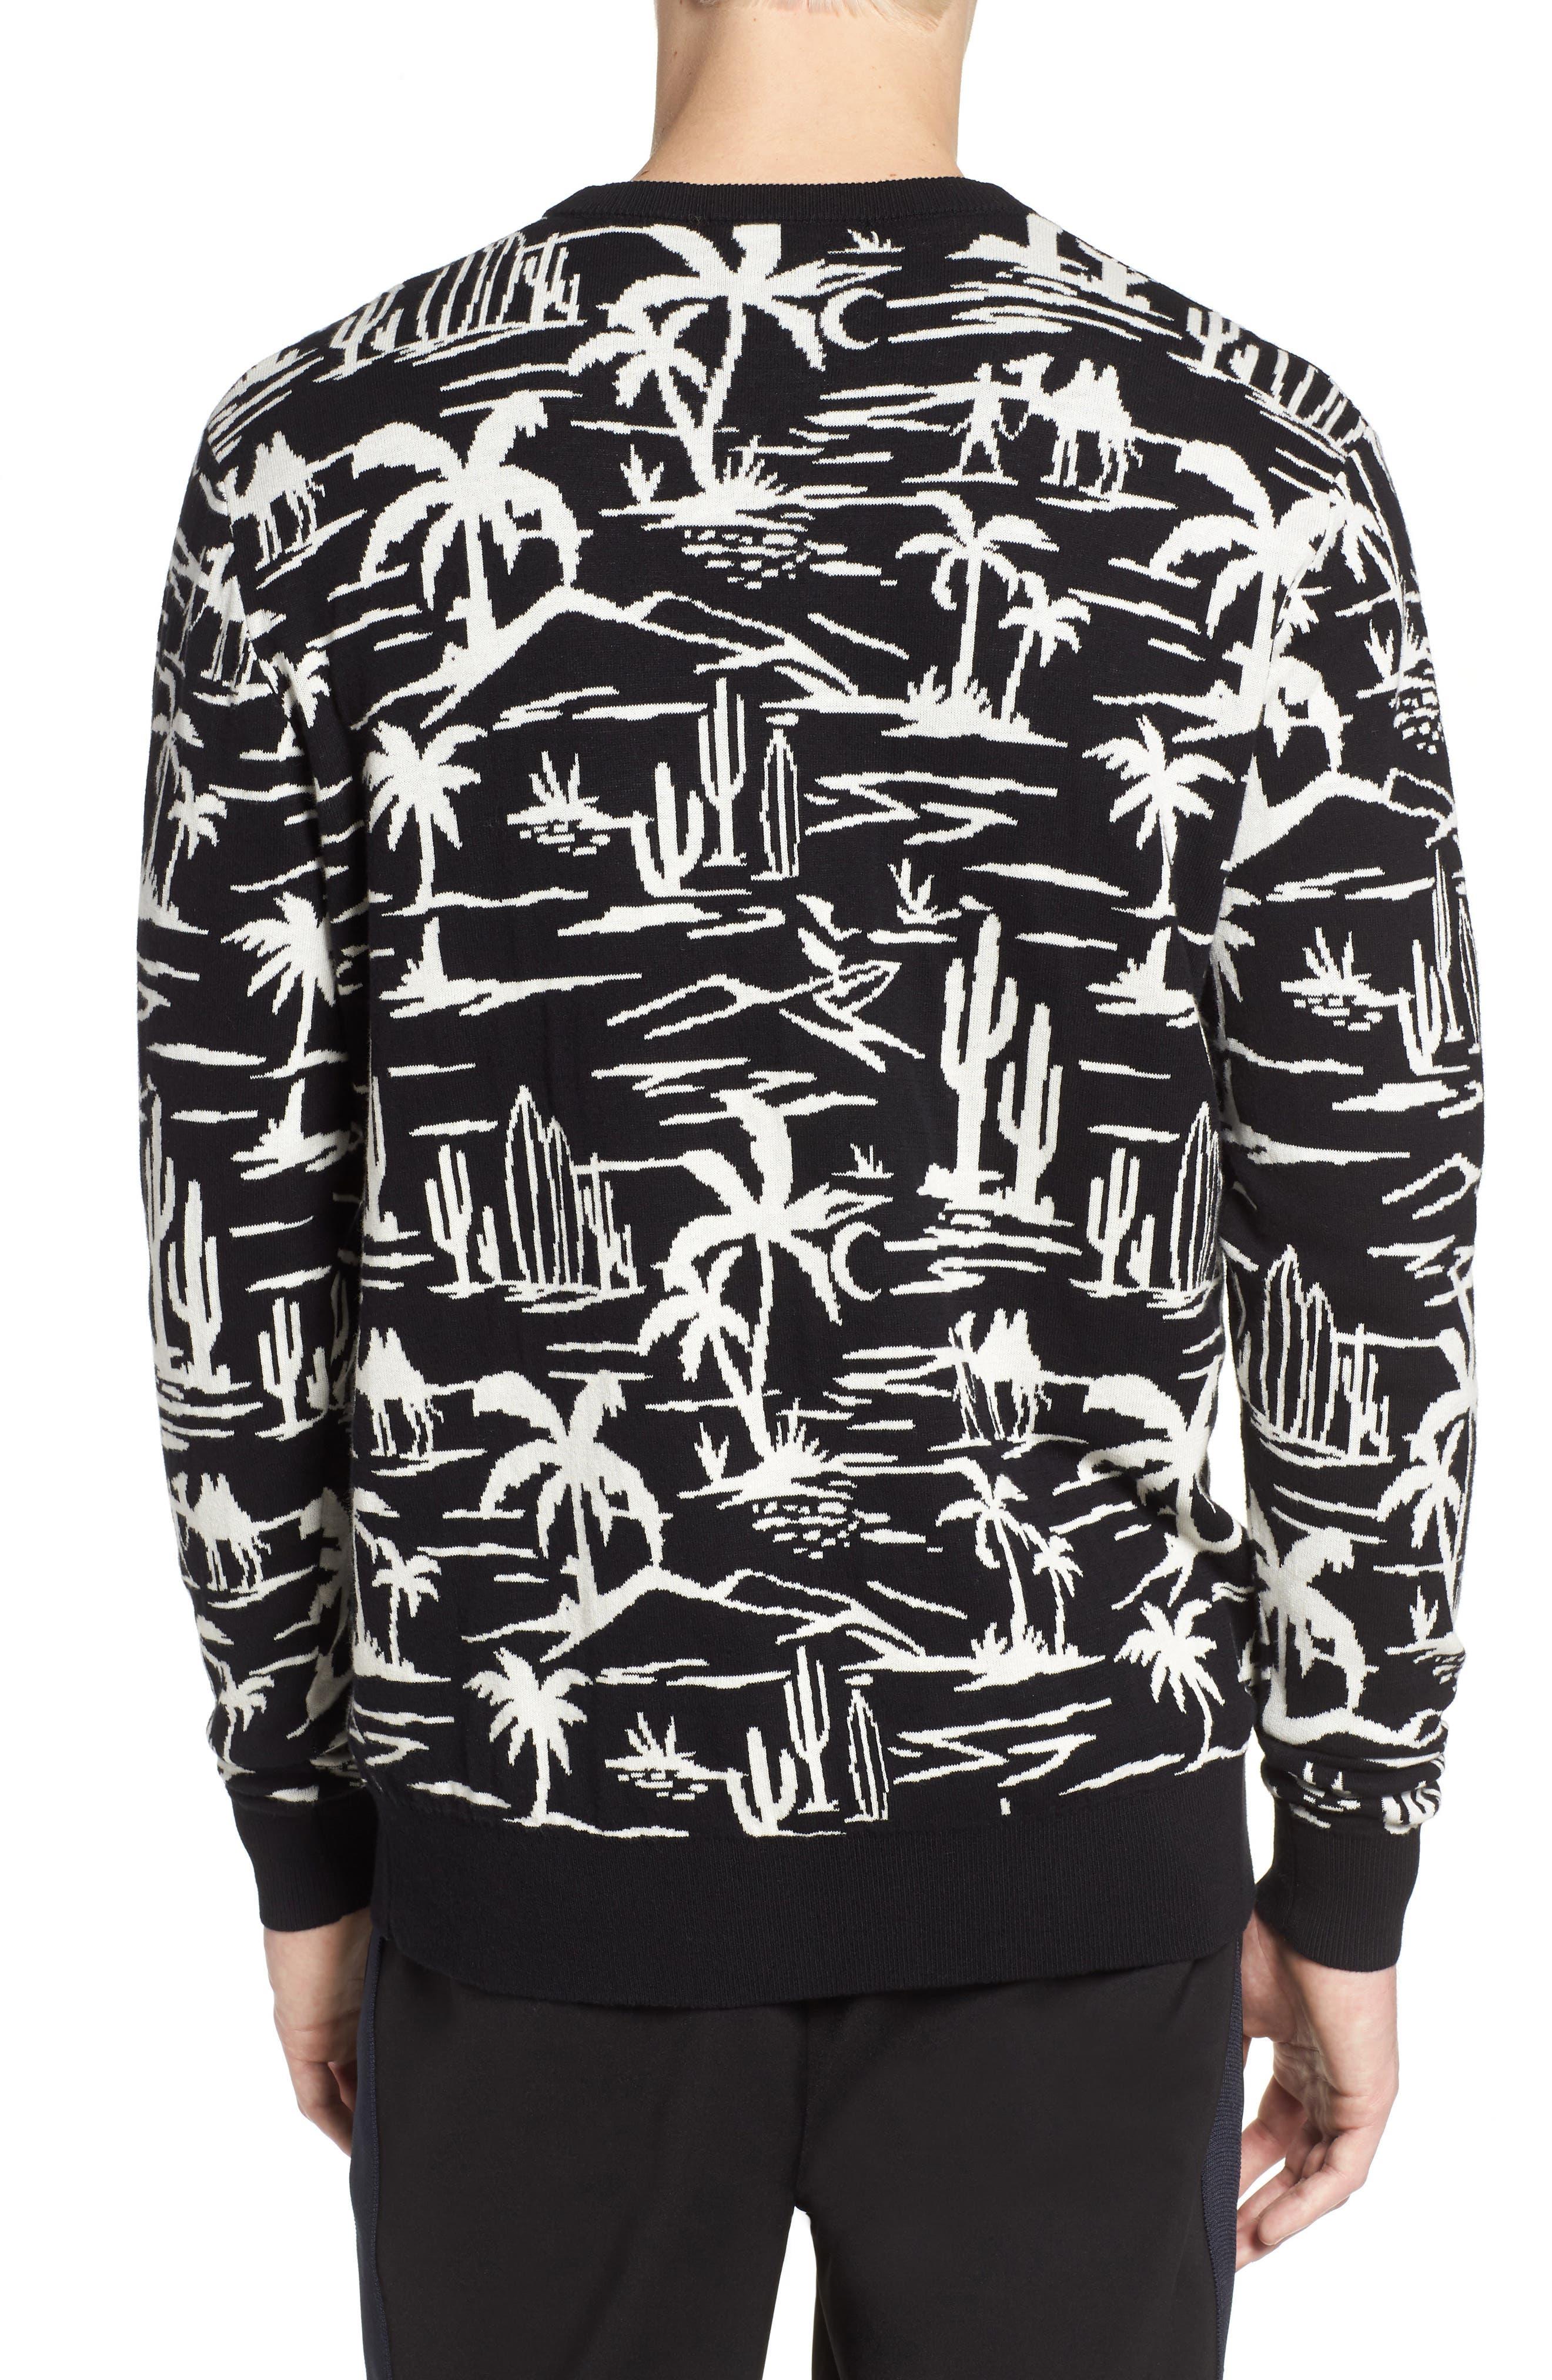 Jacquard Pattern Sweatshirt,                             Alternate thumbnail 2, color,                             Combo A